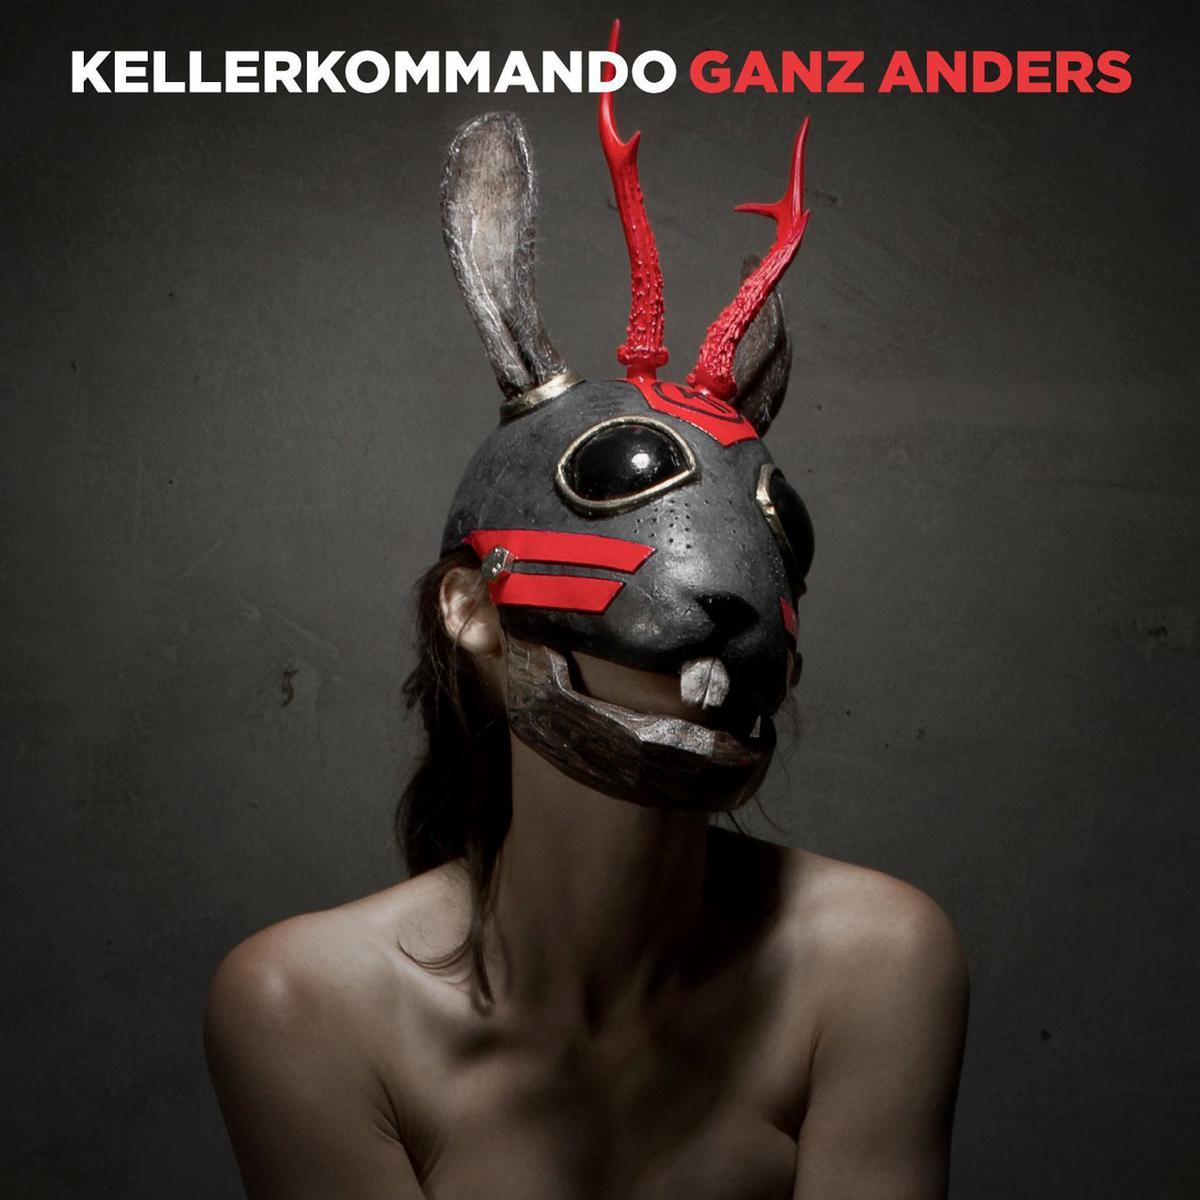 Kellerkommando